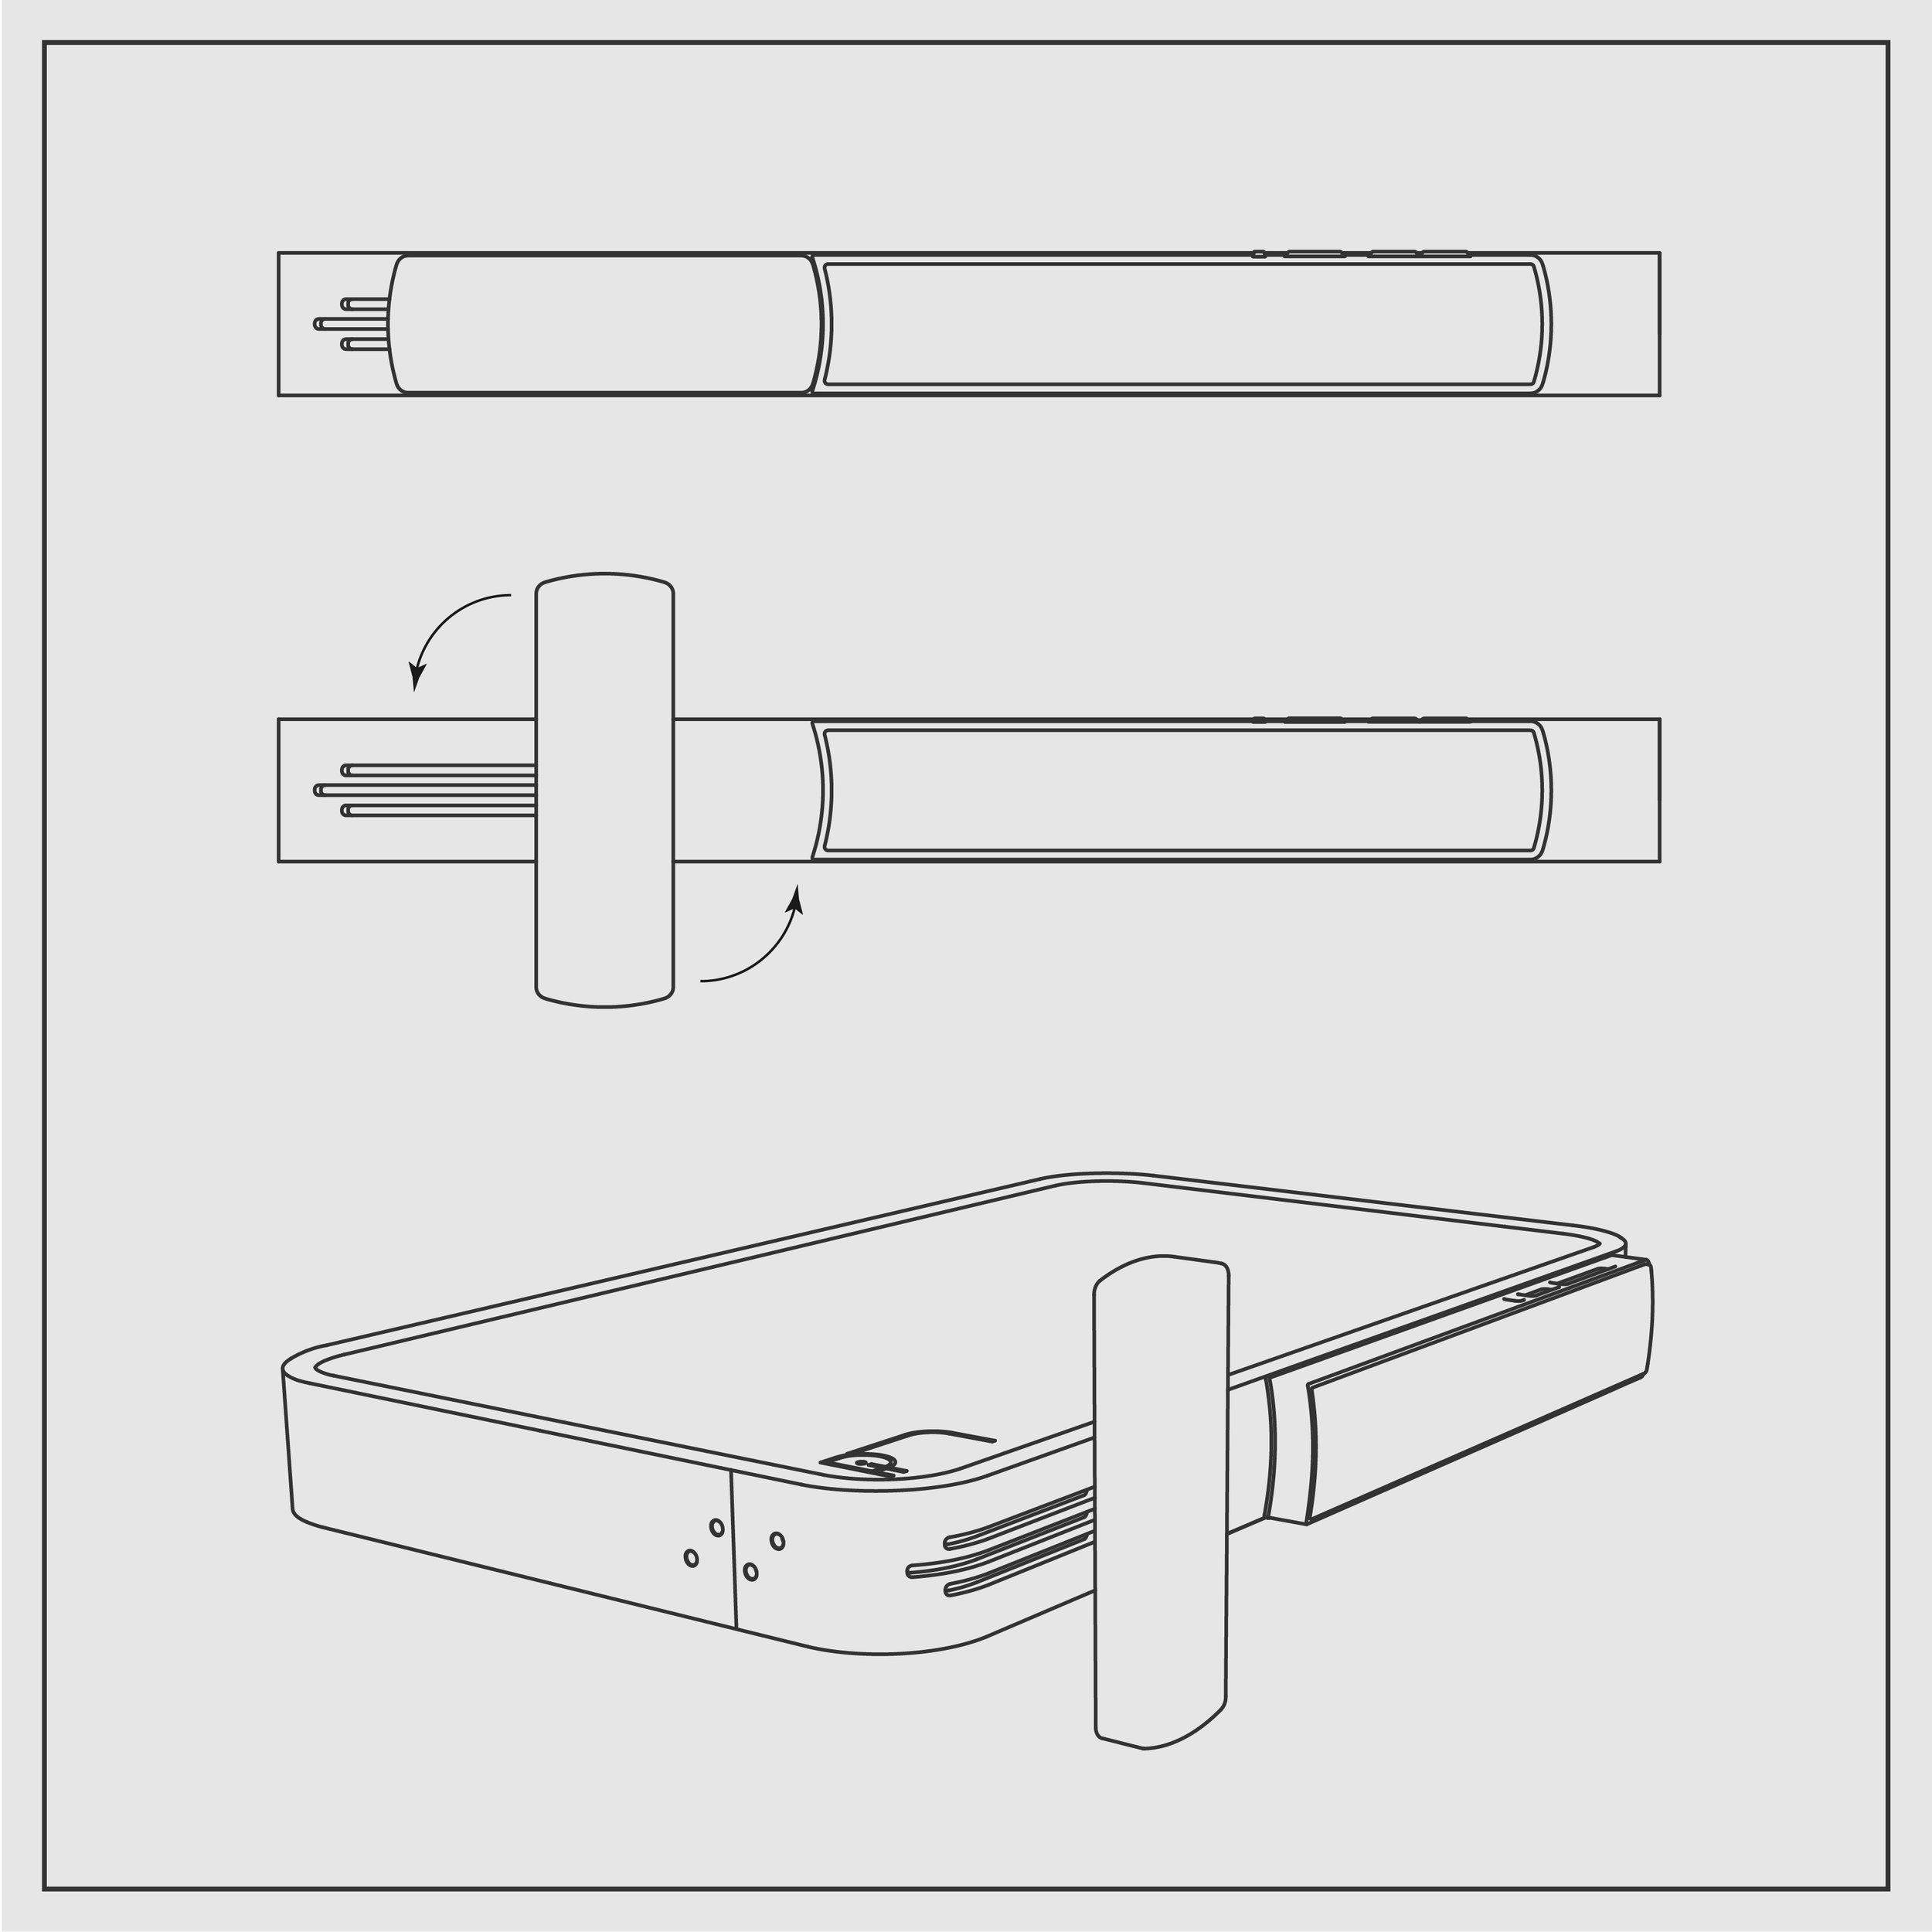 Kickstarter page 3 [Recovered]-22.jpg